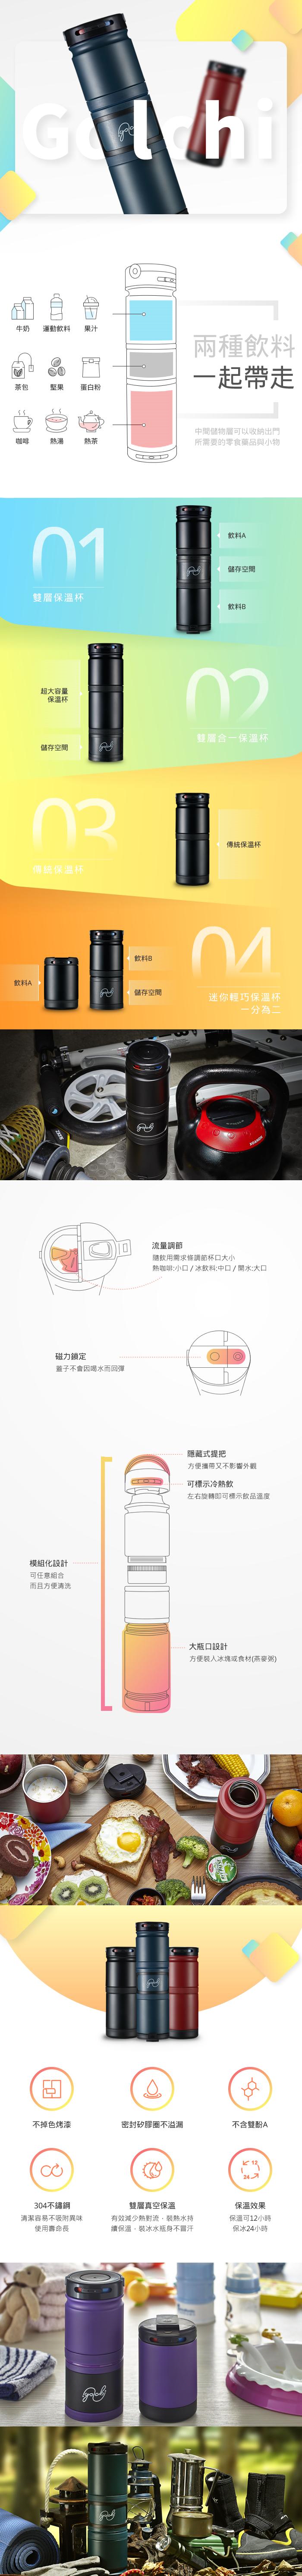 Golchi|多功能 304 不鏽鋼淬煉保溫瓶 - 紅色